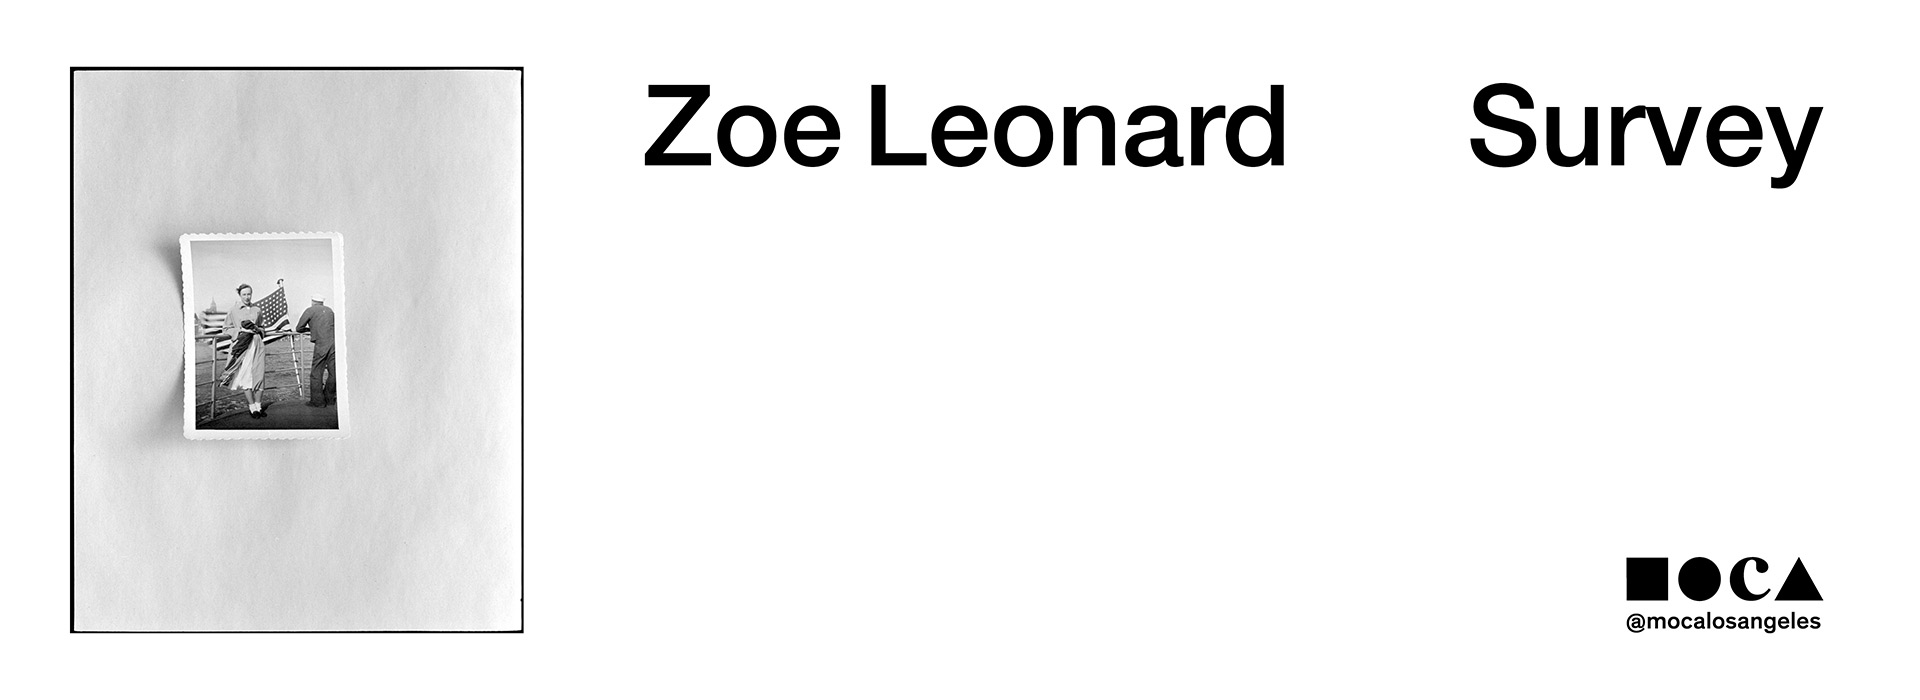 zoe leonard survey at moca